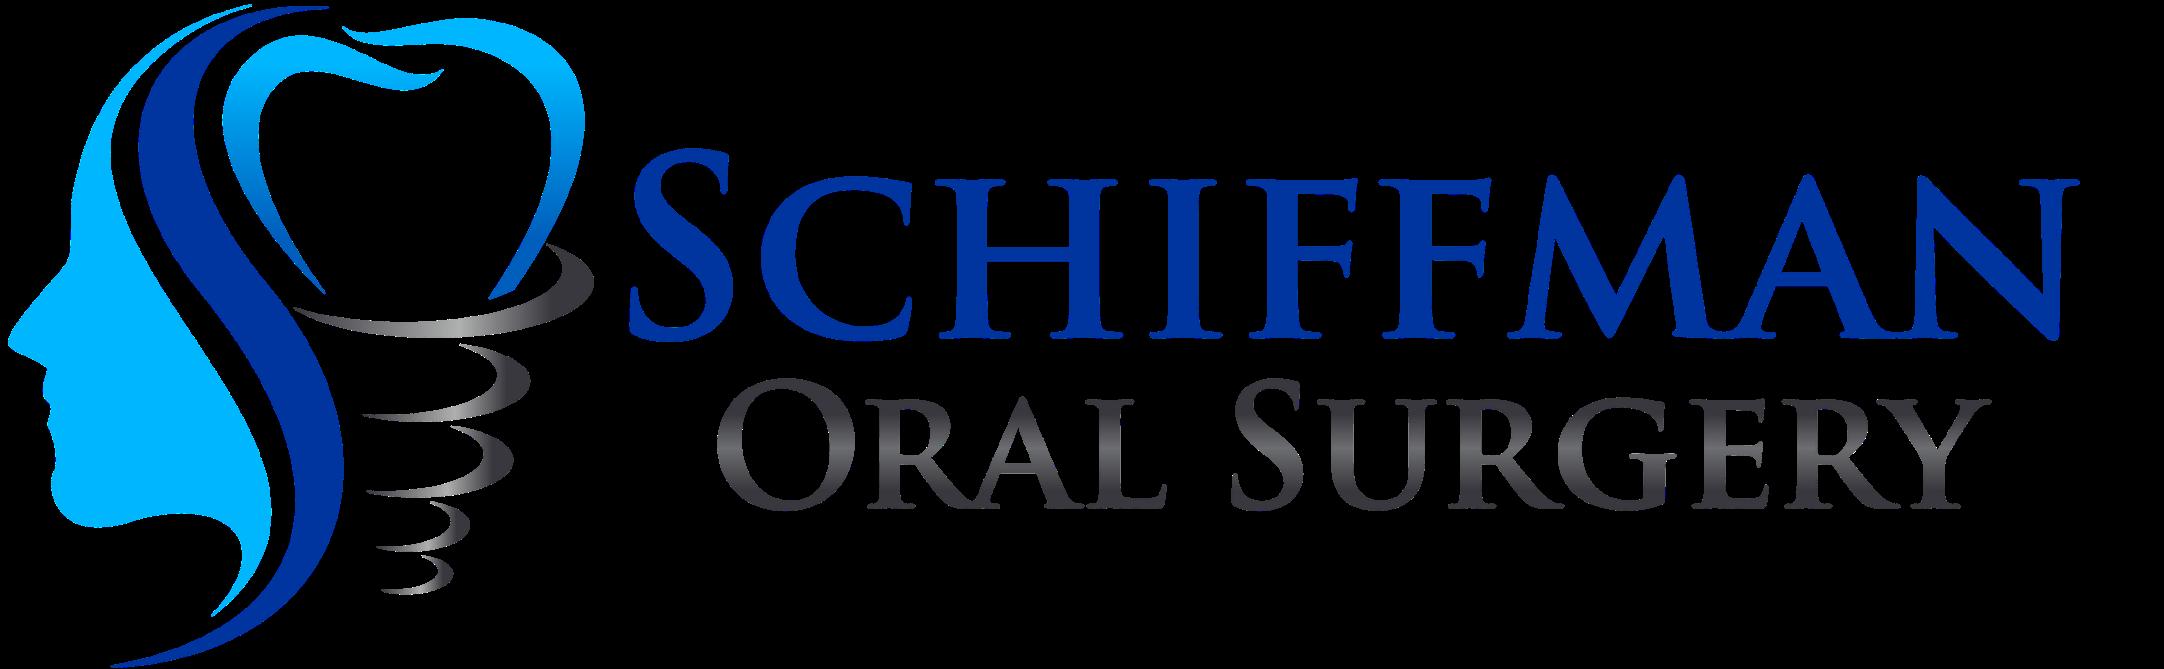 Best Oral Surgeon Near You Long Island Schiffman Oral Surgery